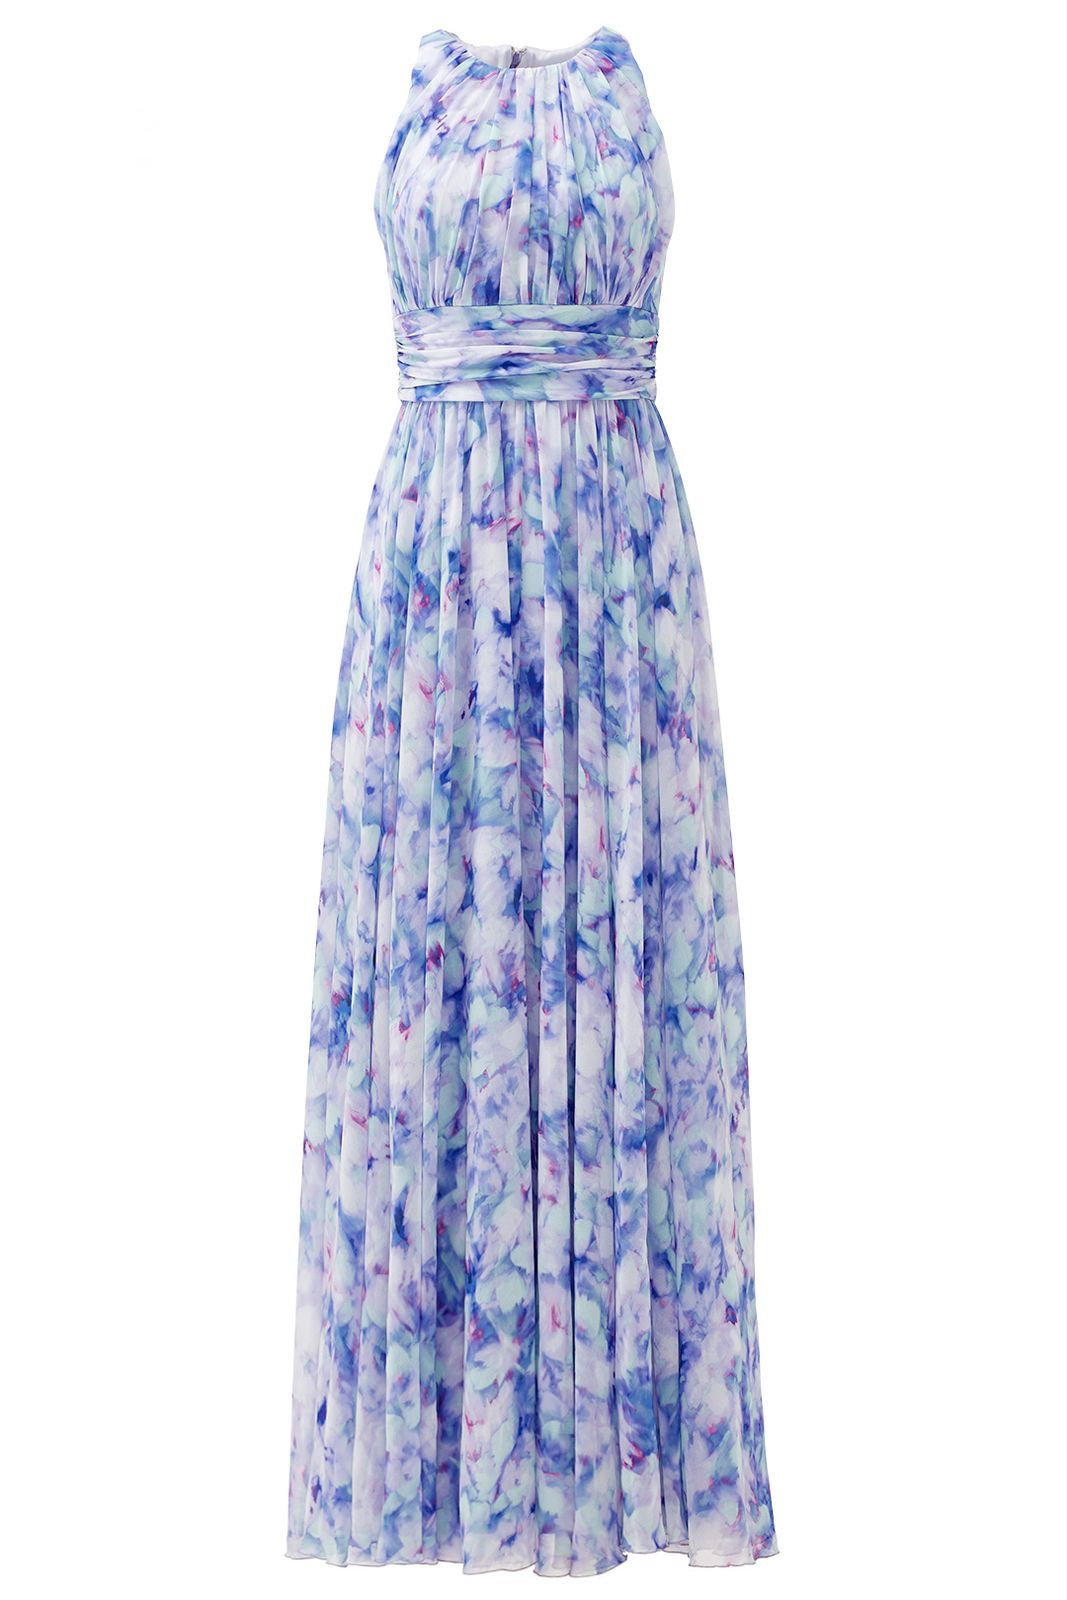 Plus size wedding dress rental  Nice Awesome Badgley Mischka Blue Womenus Size  Floral Print